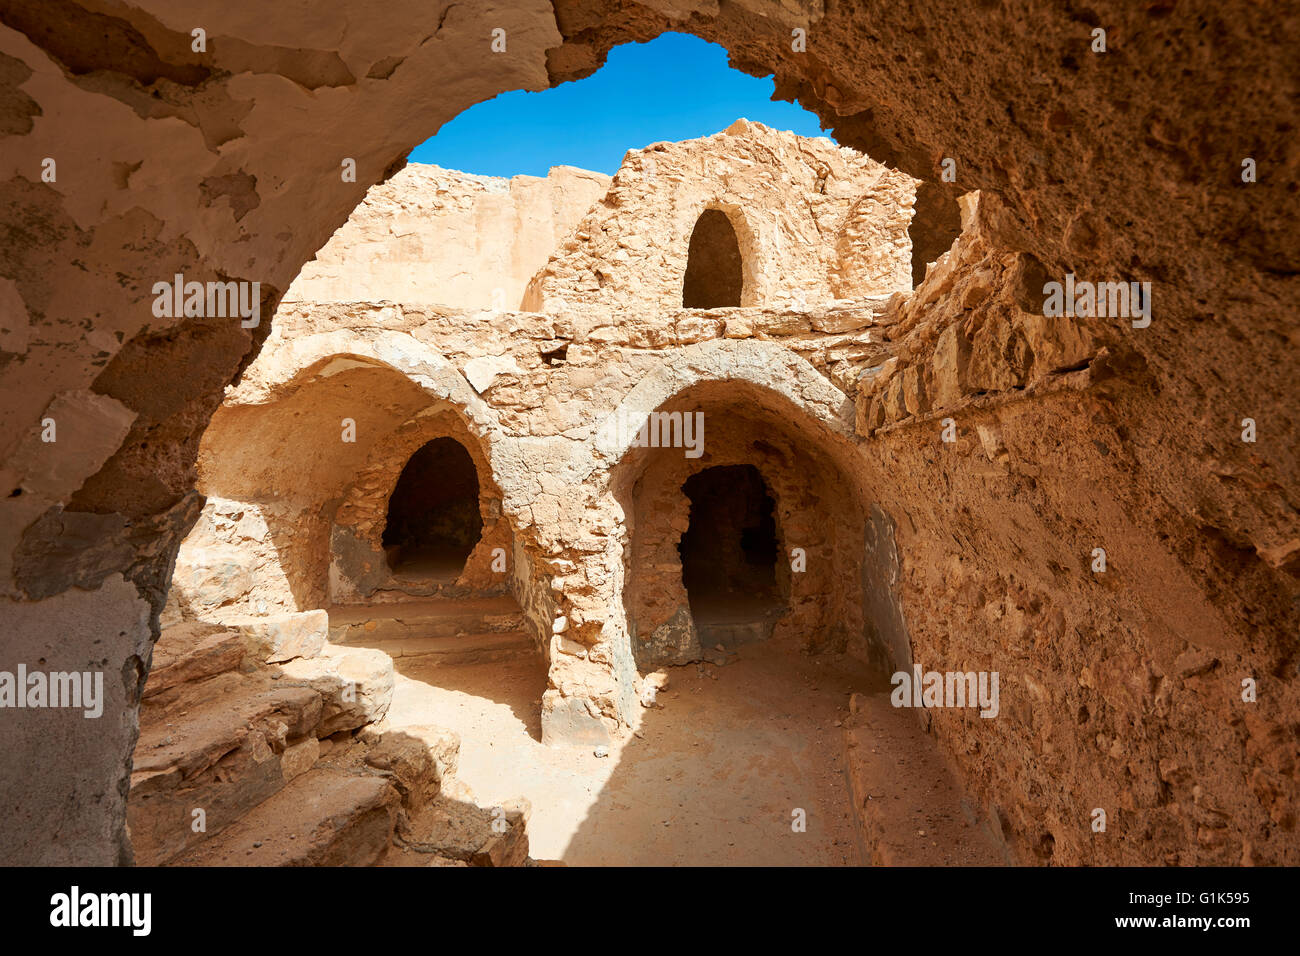 The northern Sahara mud brick ghorfa storage granaries (Ksar) of Hedada or Hadada, near Tetouin, Tunisia. - Stock Image